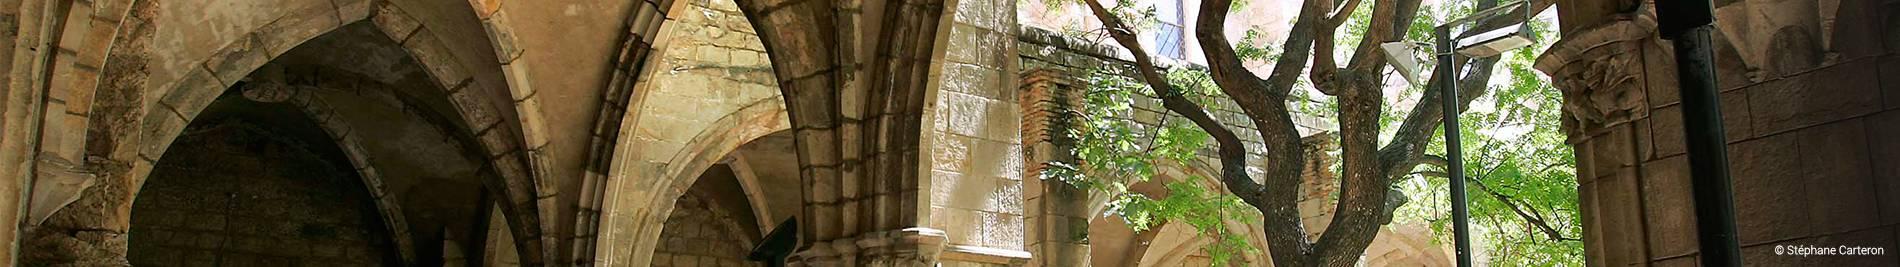 La Barcelone médiévale